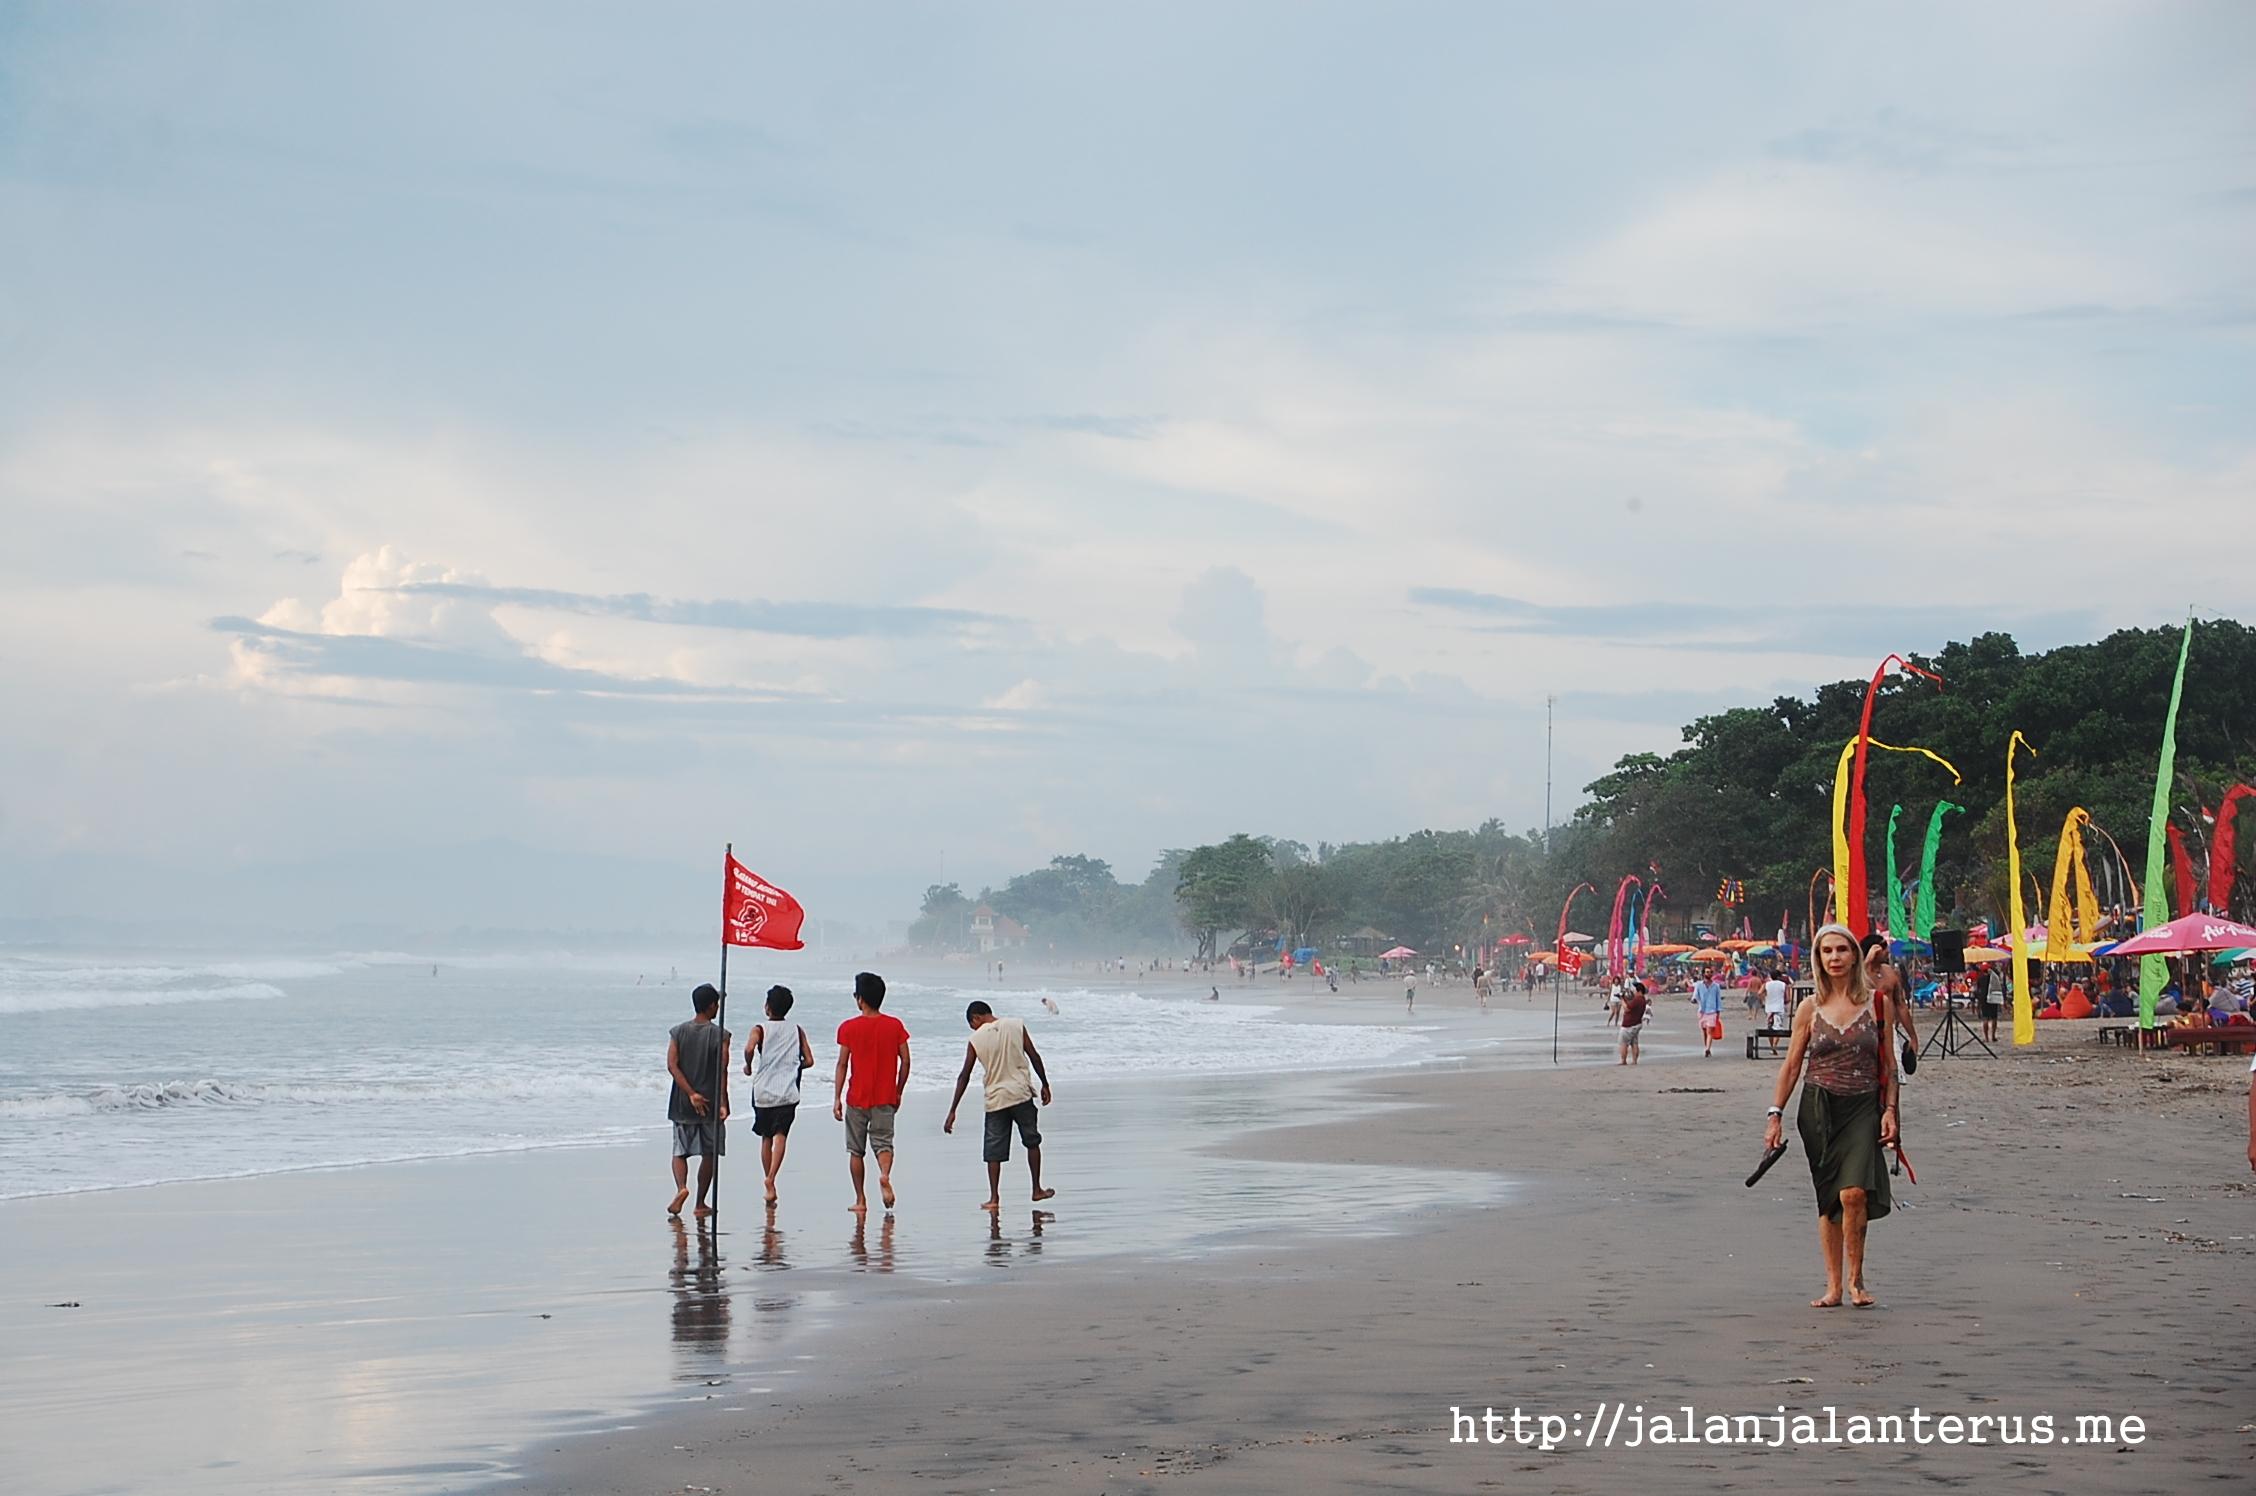 Menjelajahi Pantai Tersembunyi Bali Double Beach Nagari Doublesix Kab Badung